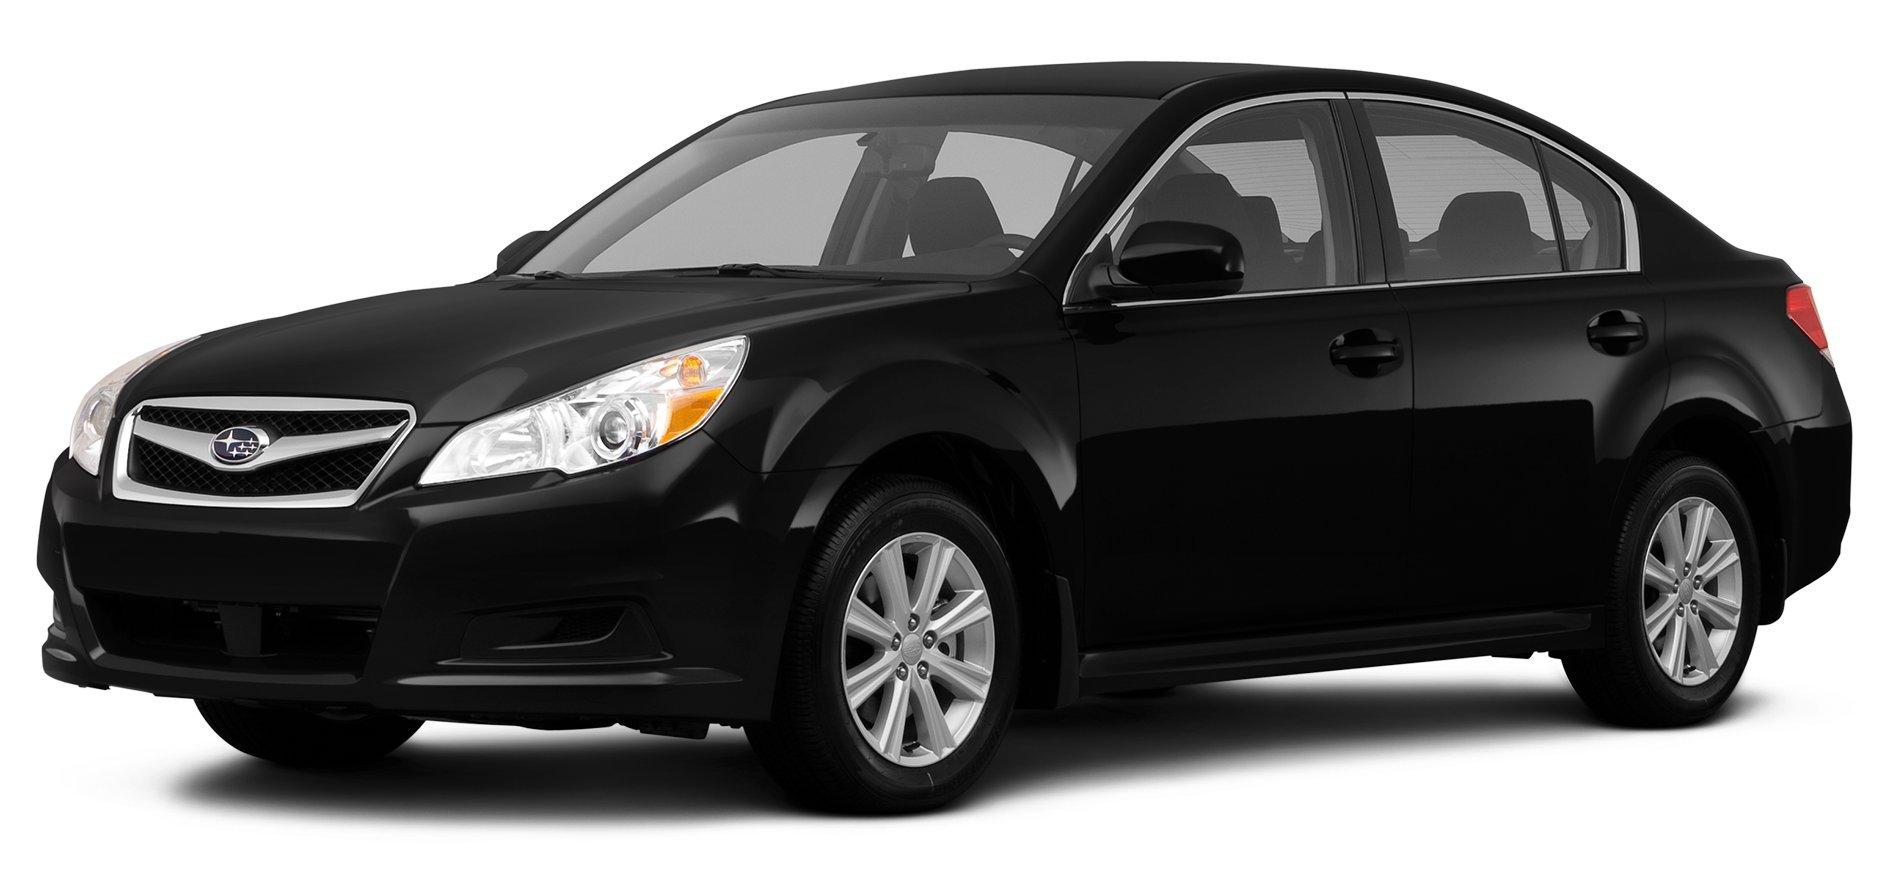 2012 Subaru Legacy 2.5GT Limited, 4-Door Sedan 4-Cylinder Manual  Transmission ...